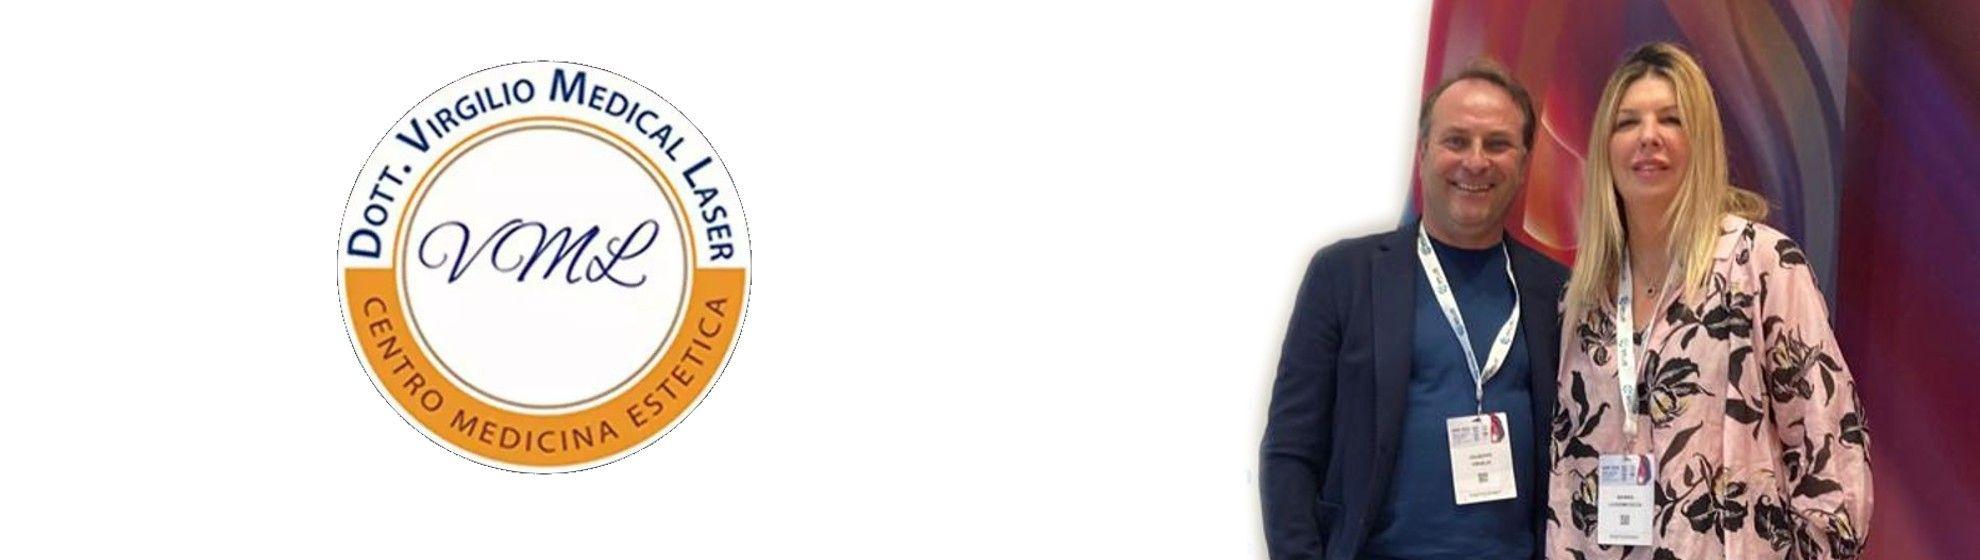 Dott. Virgilio Medical Laser